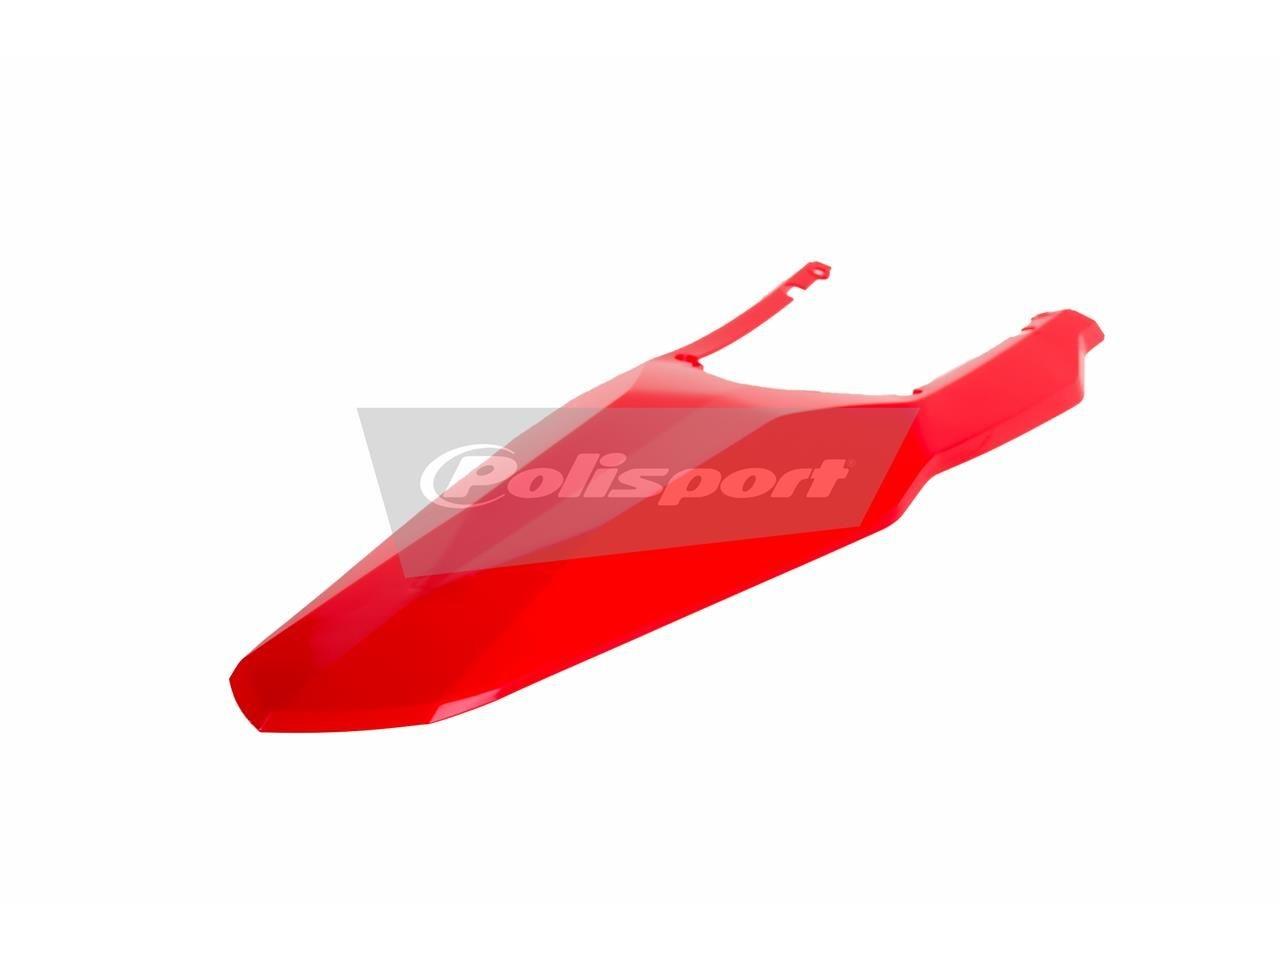 Garde-boue arrière Polisport Gas Gas 300 EC 12-15 rouge